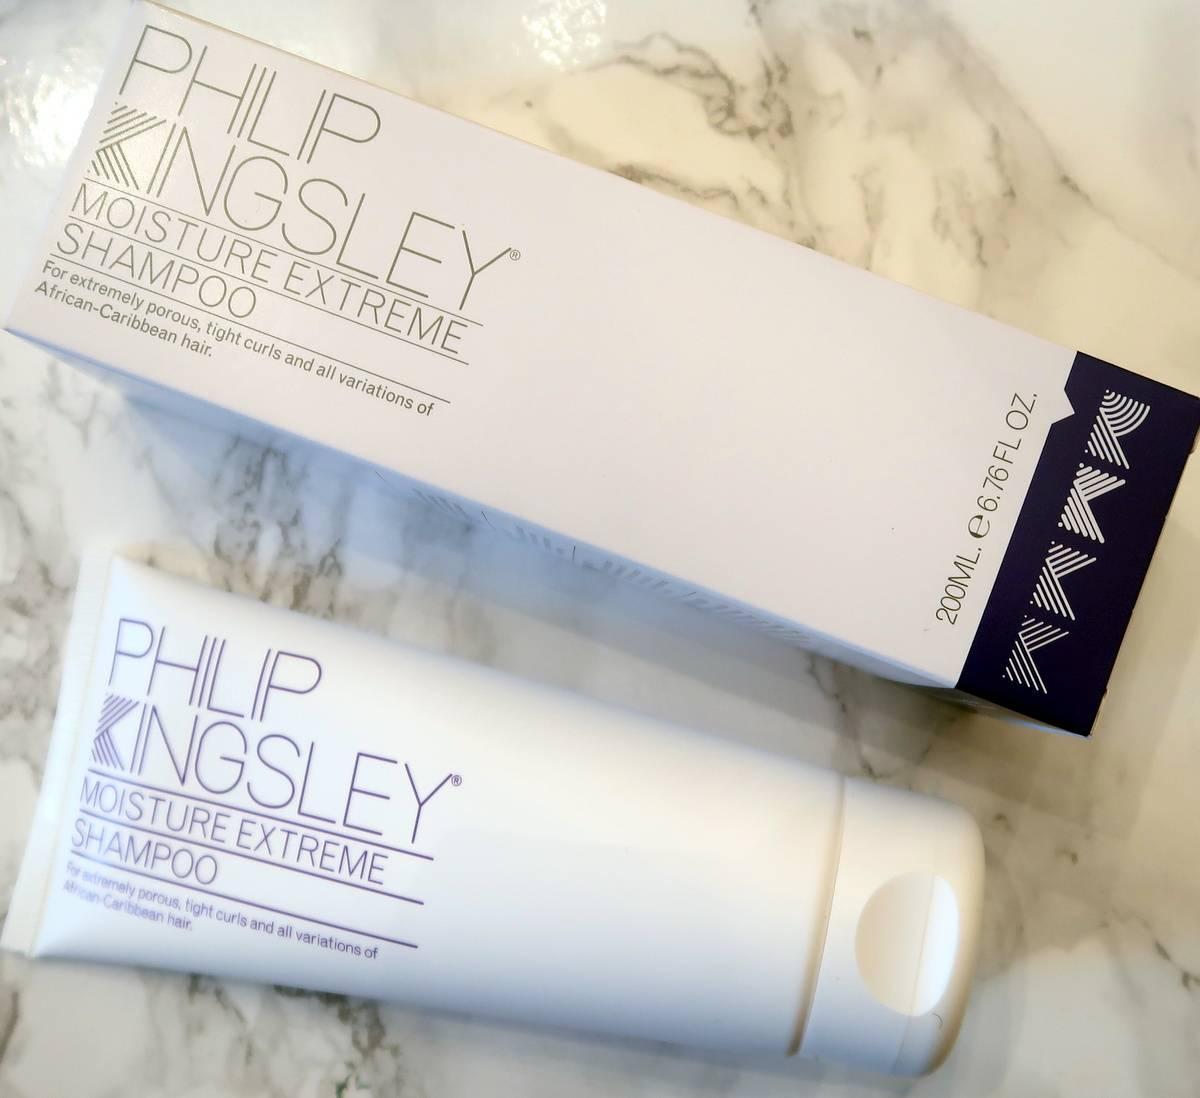 Phillip Kingsley Moisture Extreme Shampoo